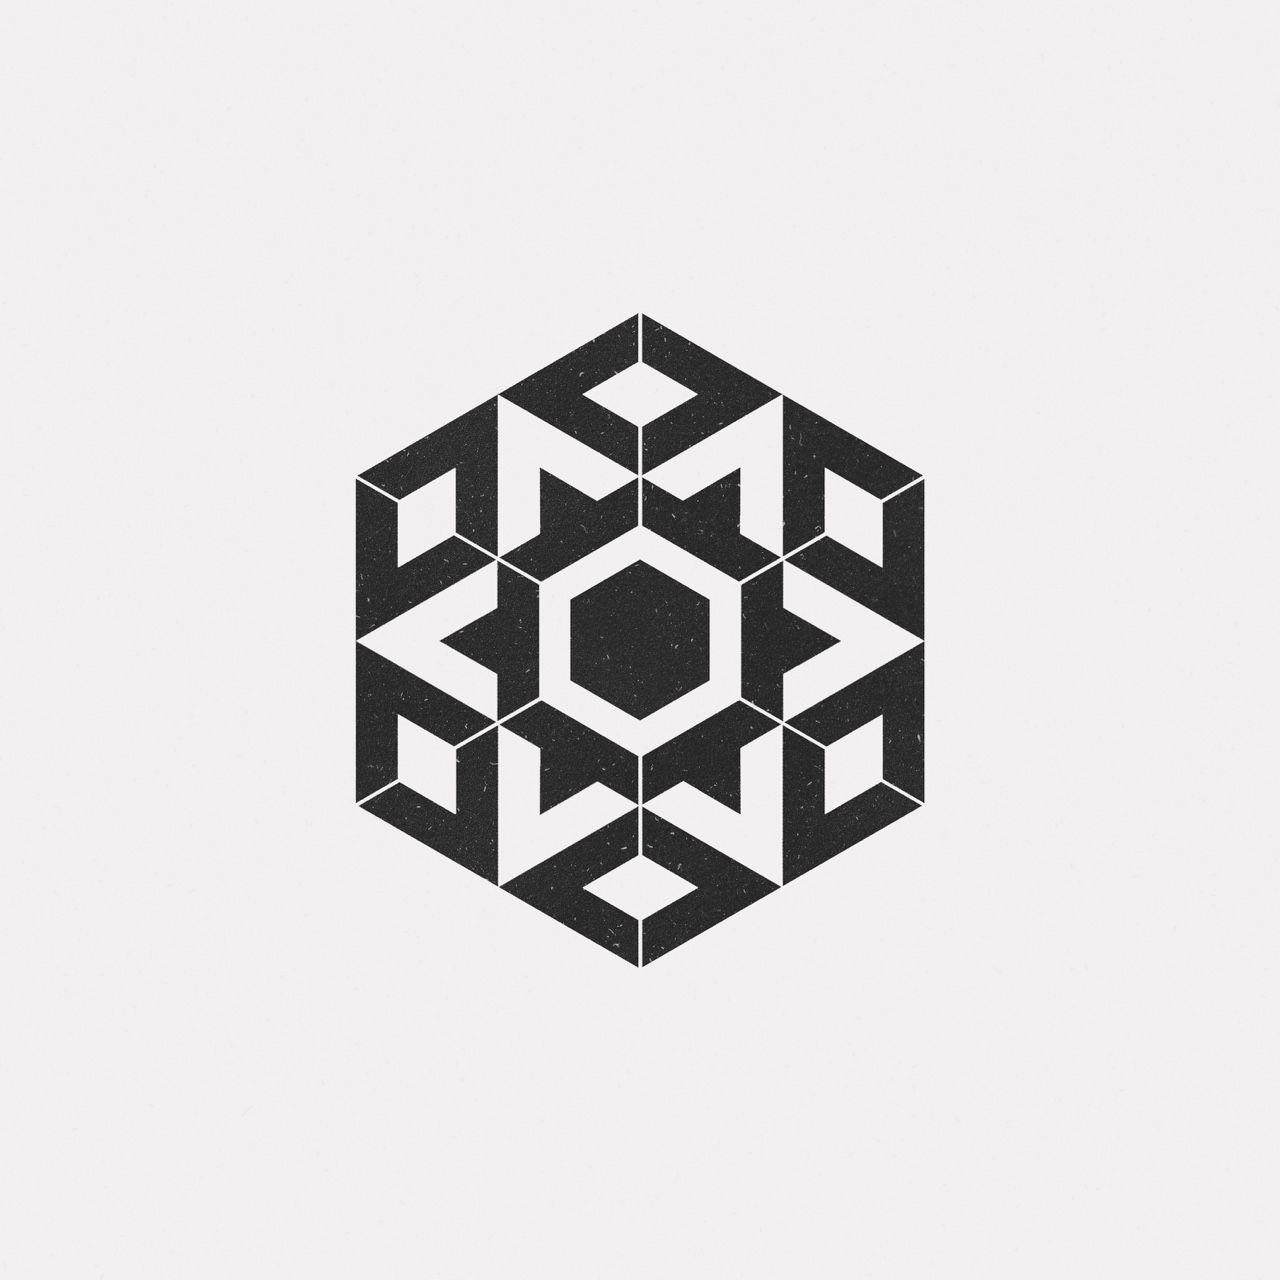 Oc  new geometric design every day also best designs images desenhos cranios pinturas rh br pinterest